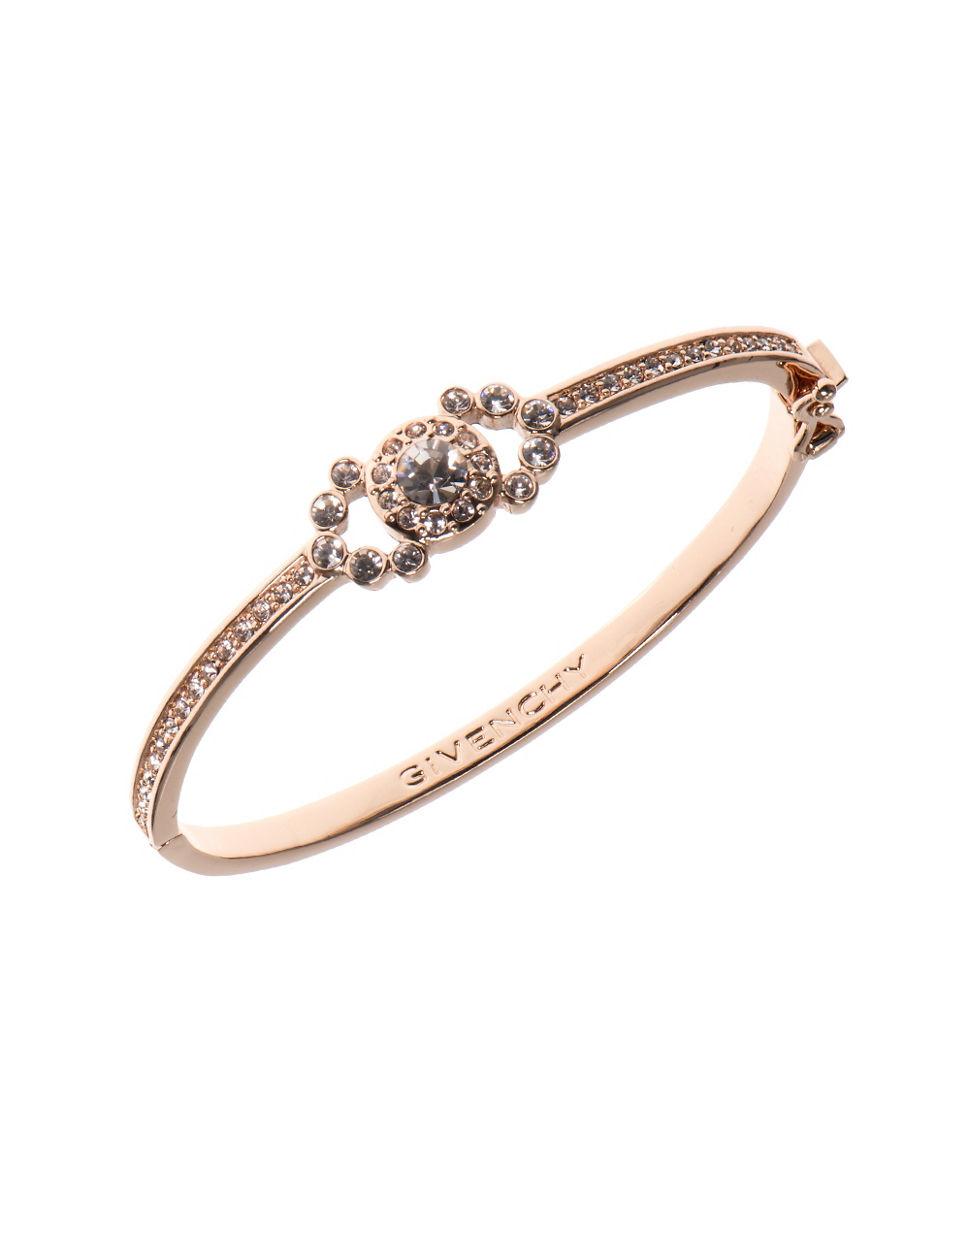 Givenchy Crystal Studded Bangle Bracelet In Metallic Lyst